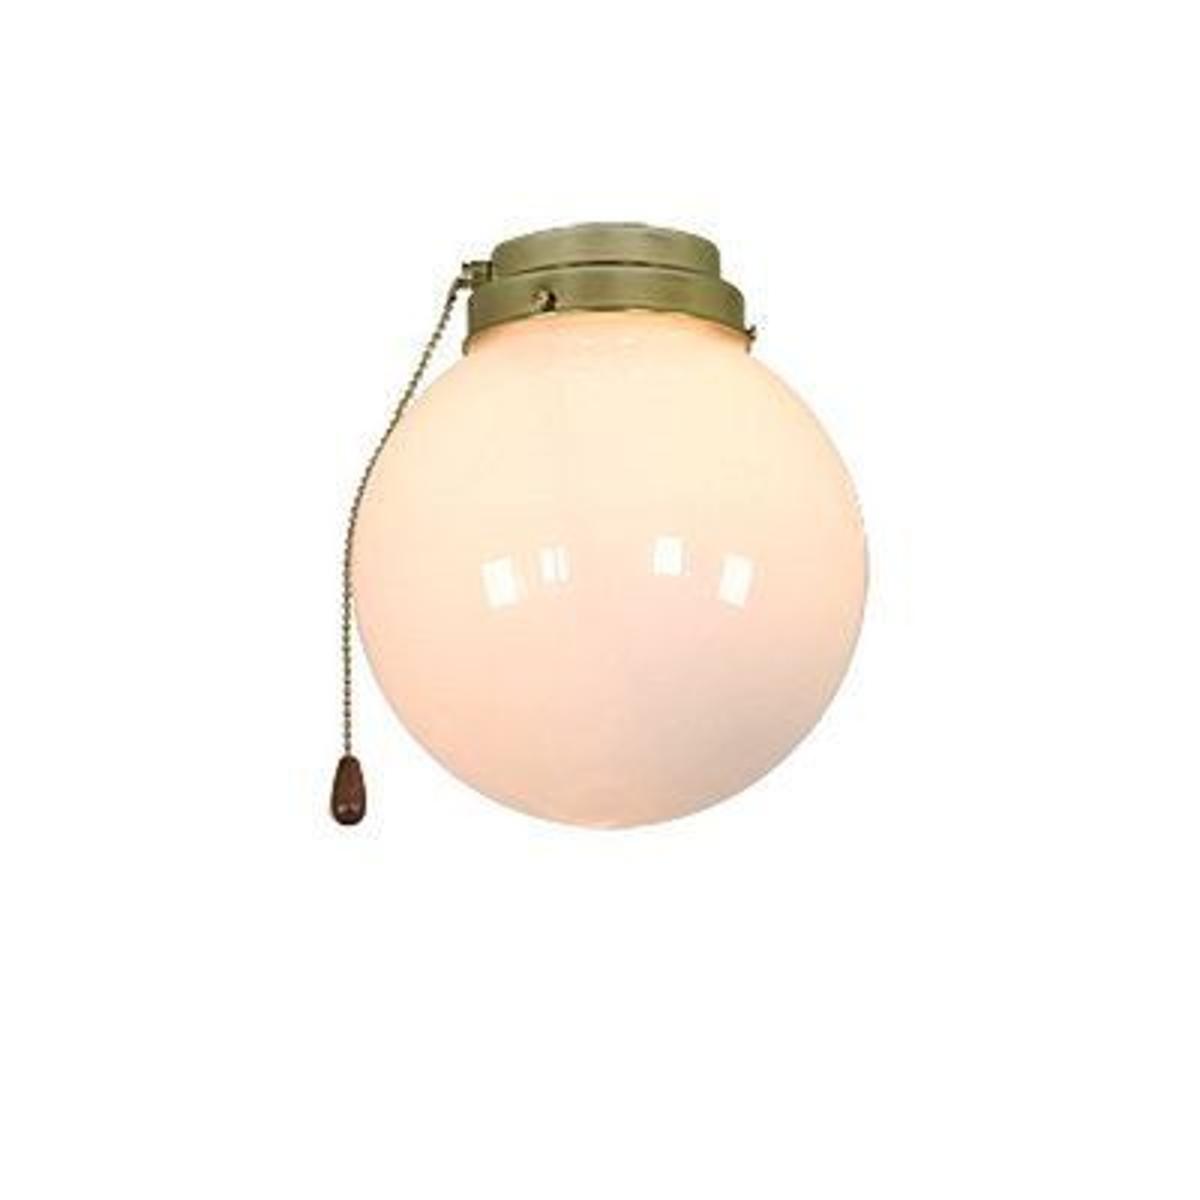 Kit Lumière Laiton poli - CASAFAN - 10253